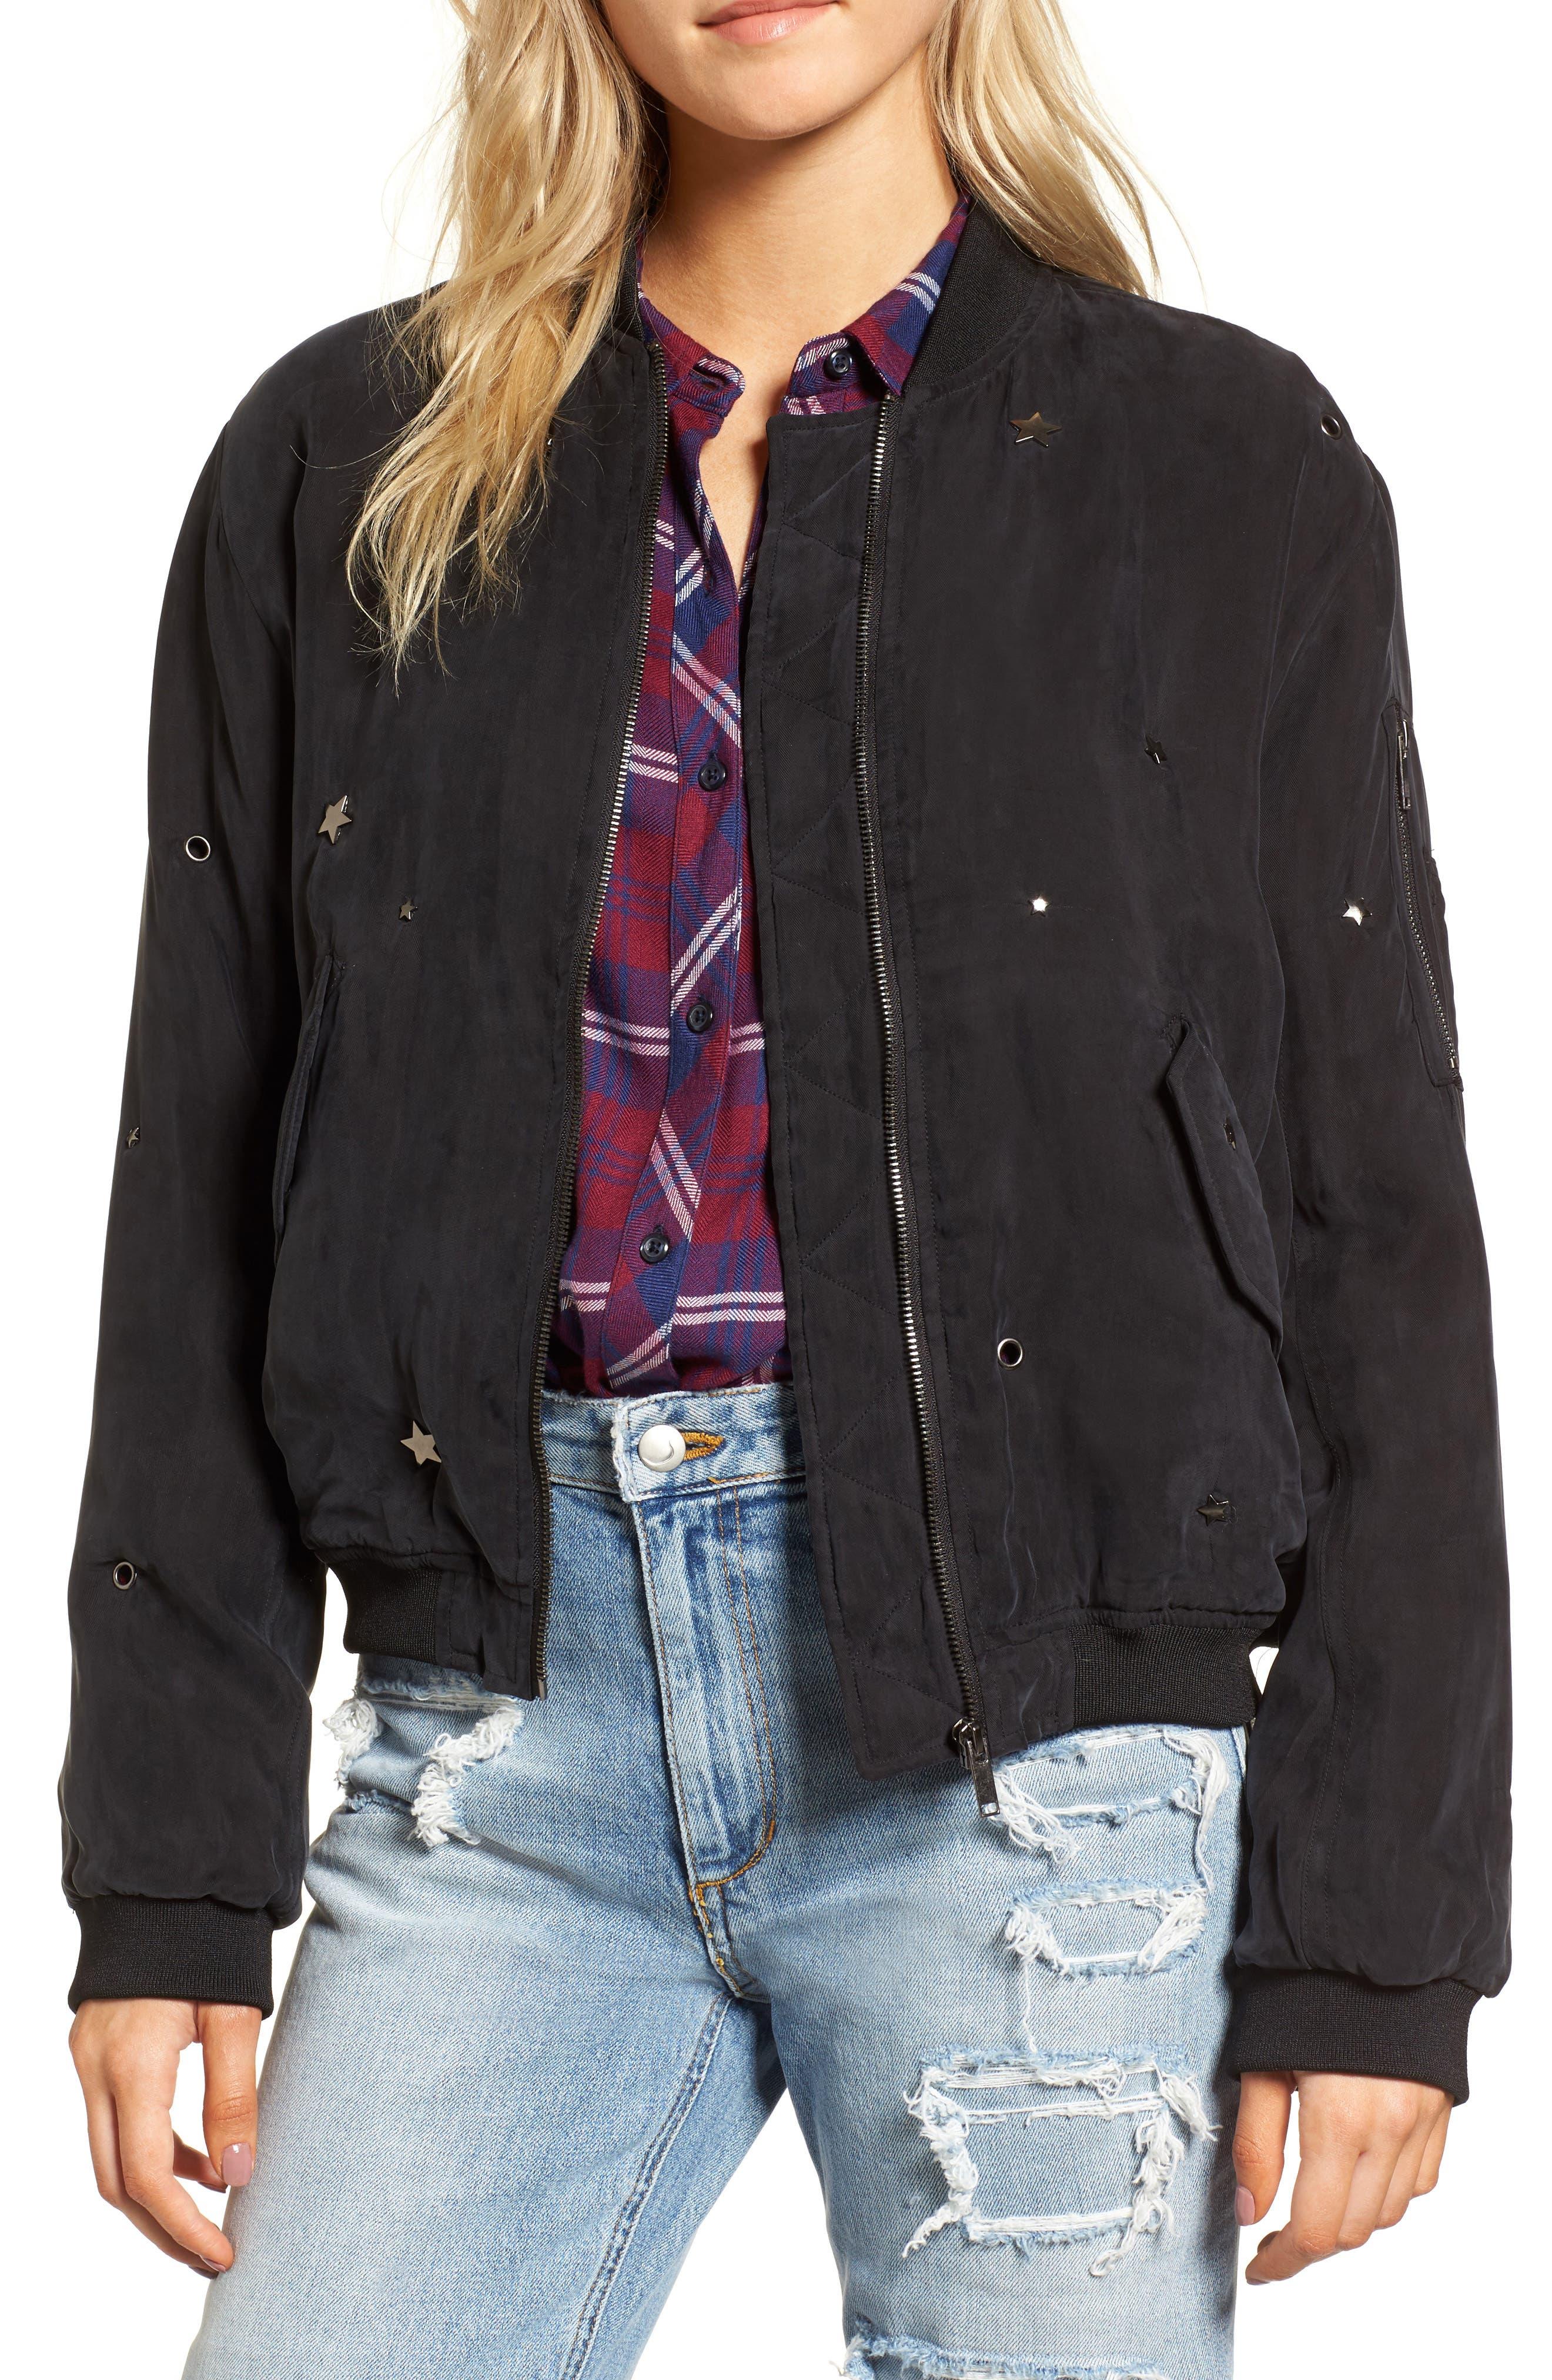 Ace Embellished Bomber Jacket,                             Main thumbnail 1, color,                             Black-Studded